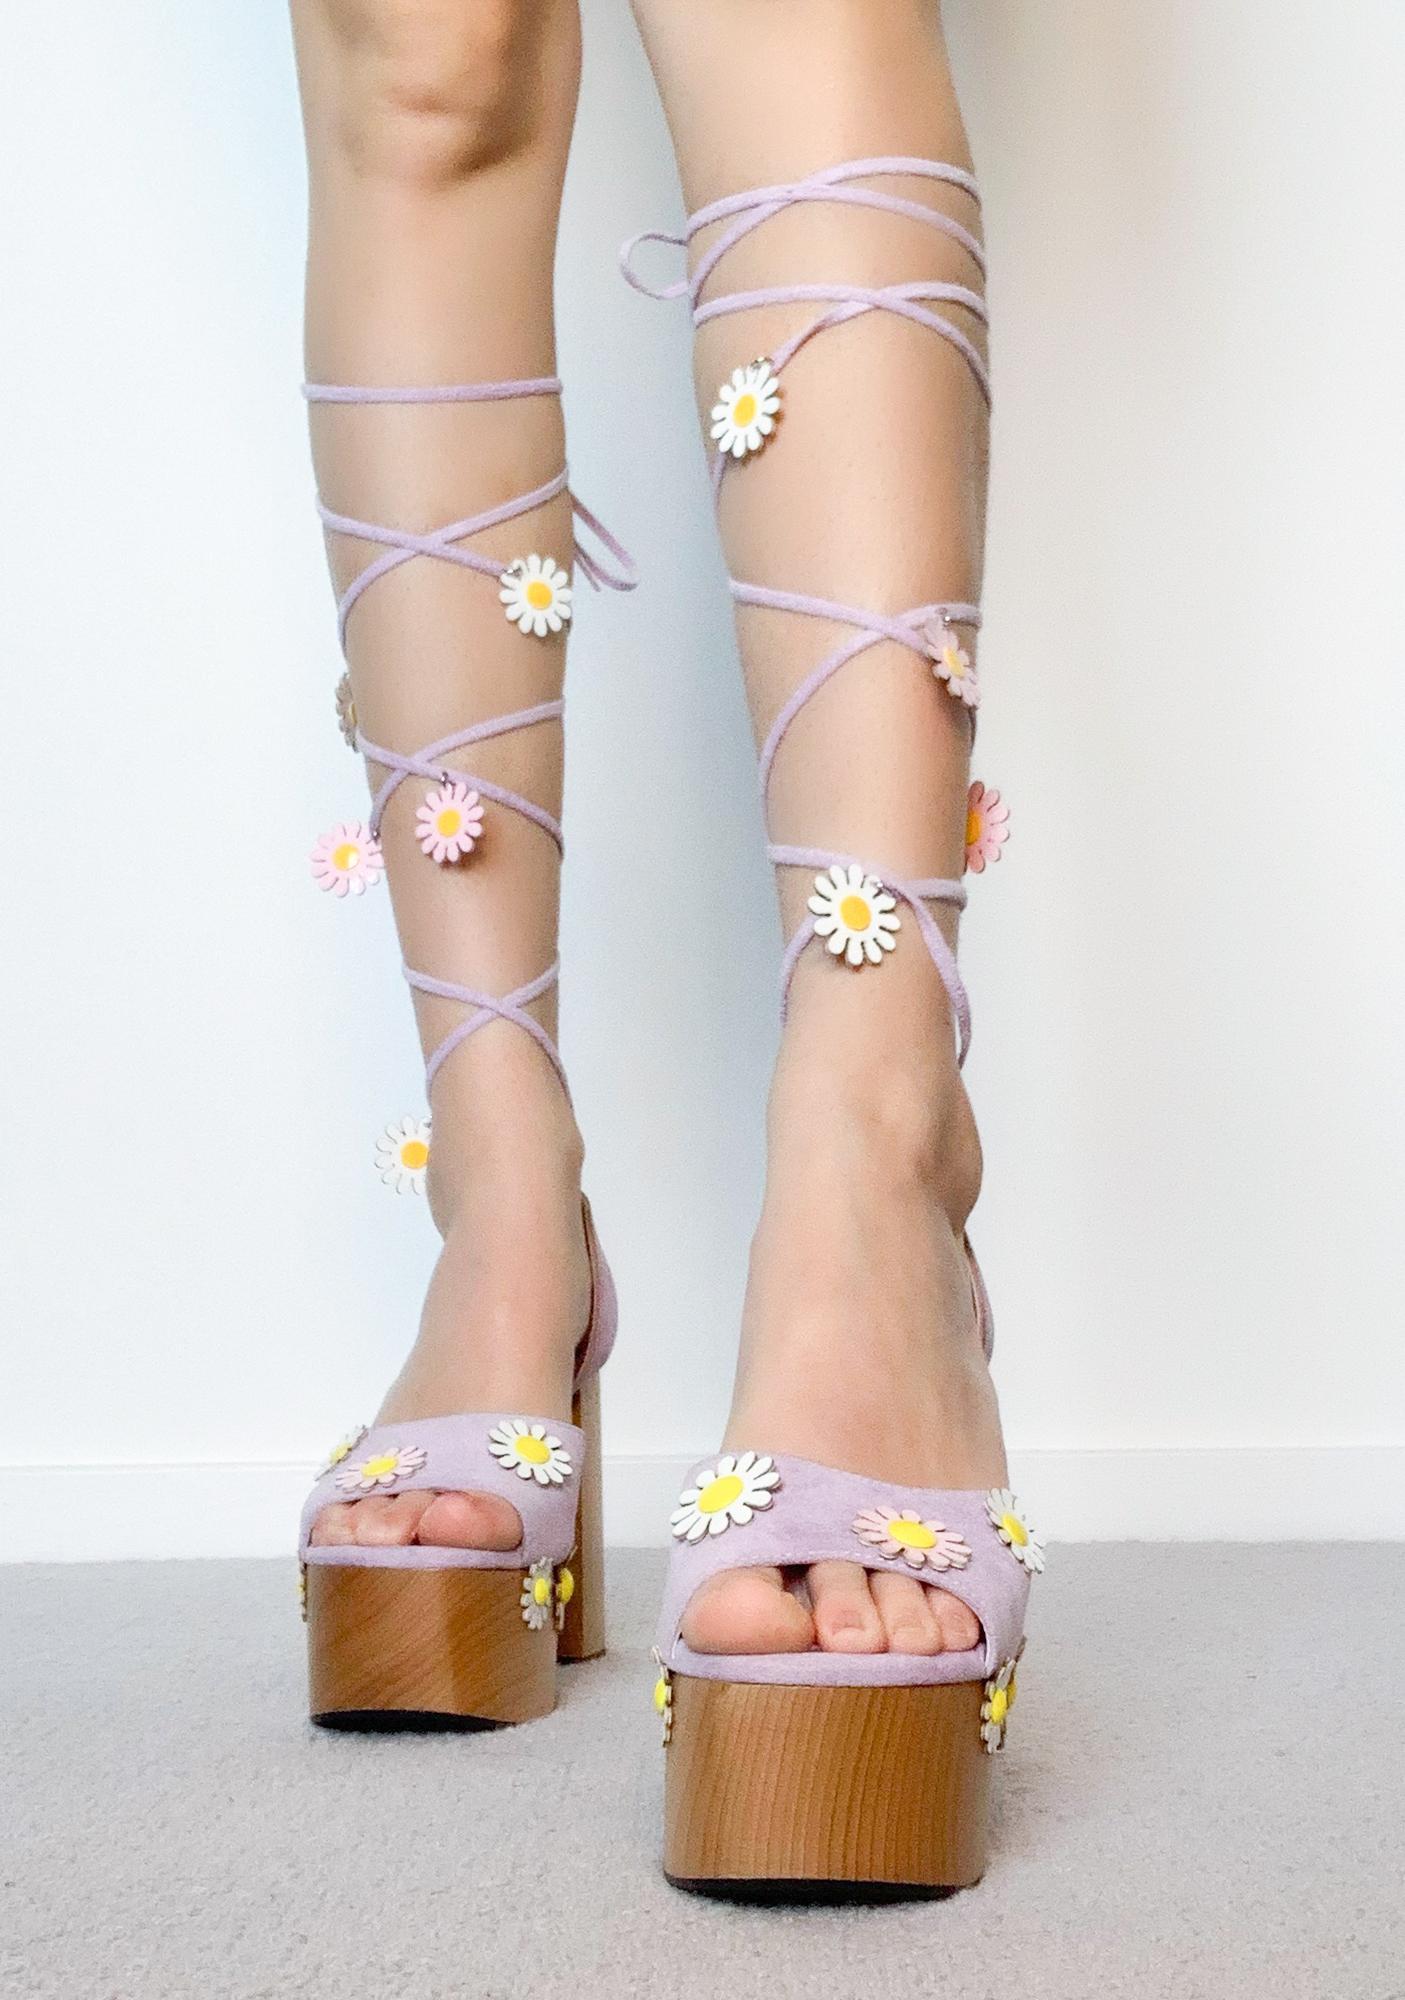 Sugar Thrillz Dreams Of Daisies Lace Up Heels